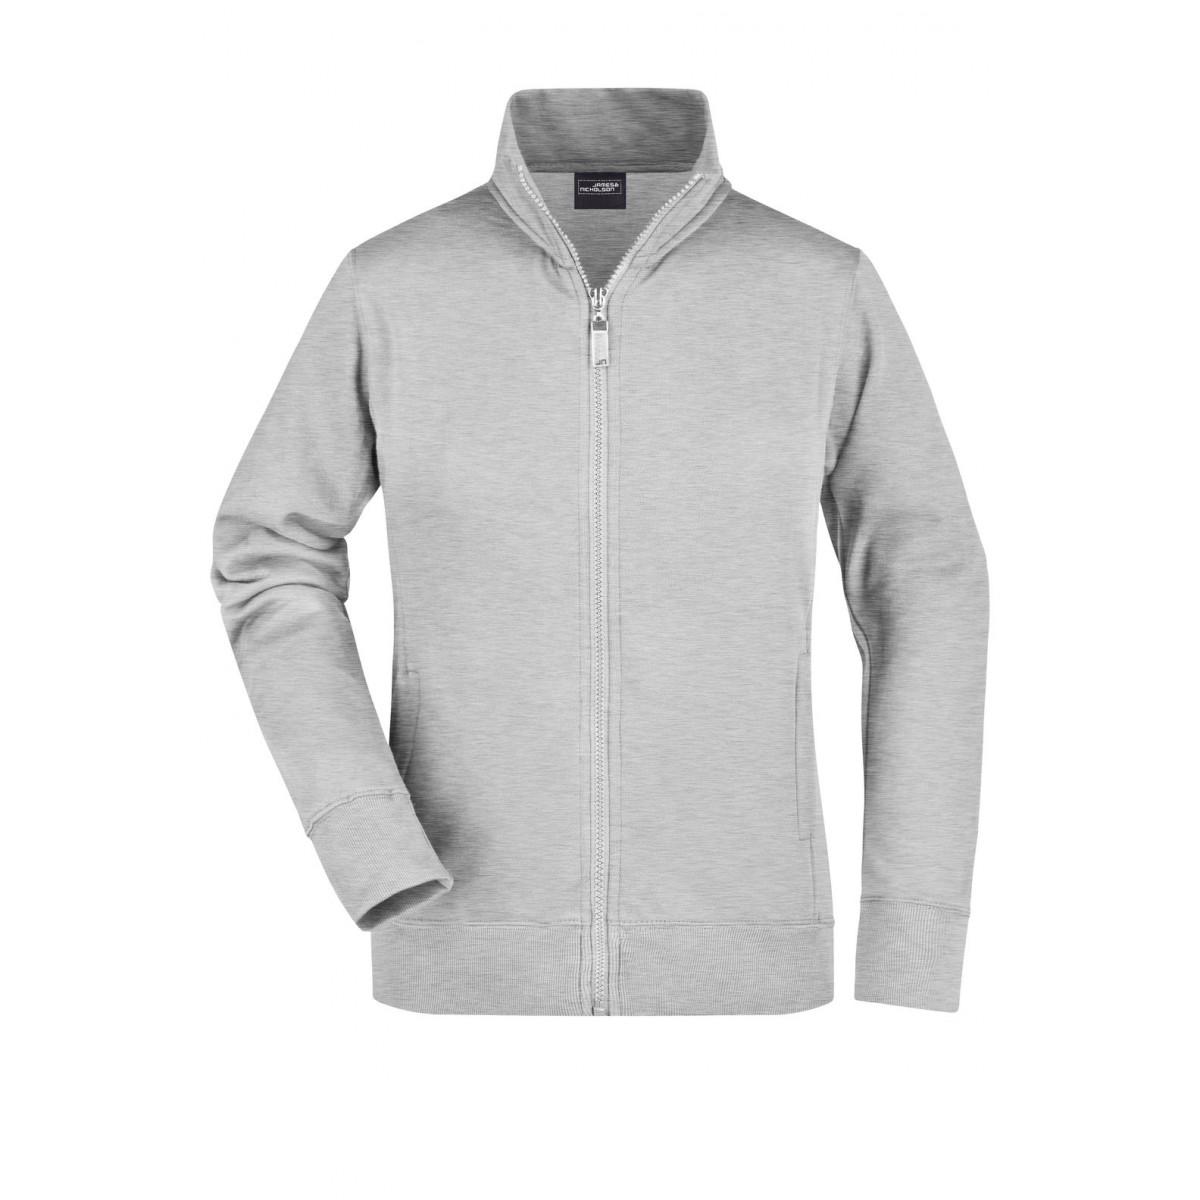 Толстовка женская JN052 Ladies Jacket - Серый меланж